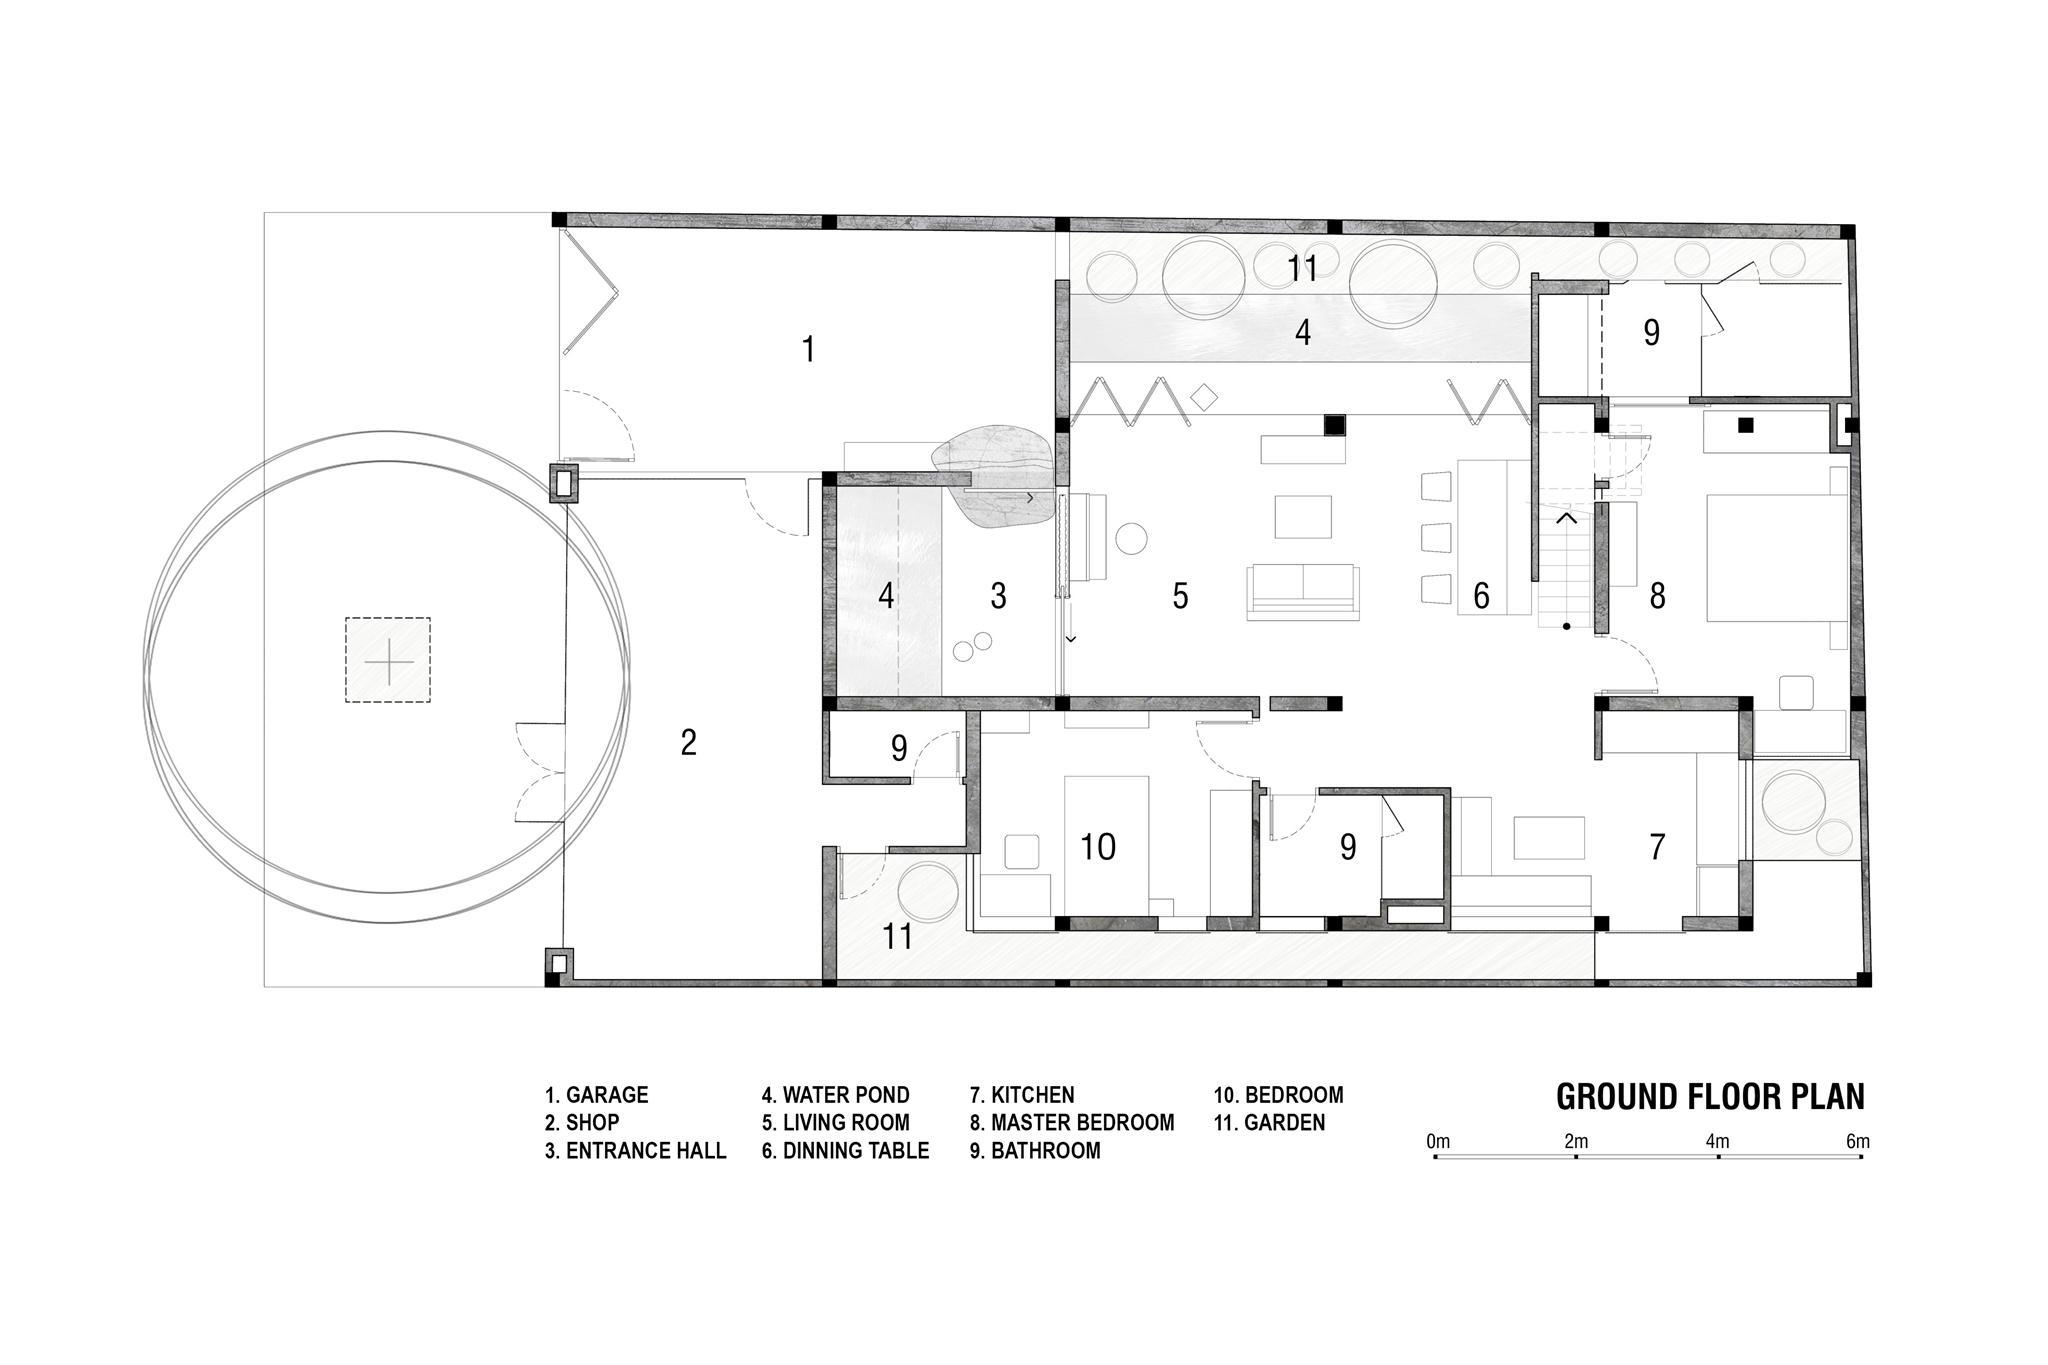 18-Ground-Floor-Plan-Copy.jpg